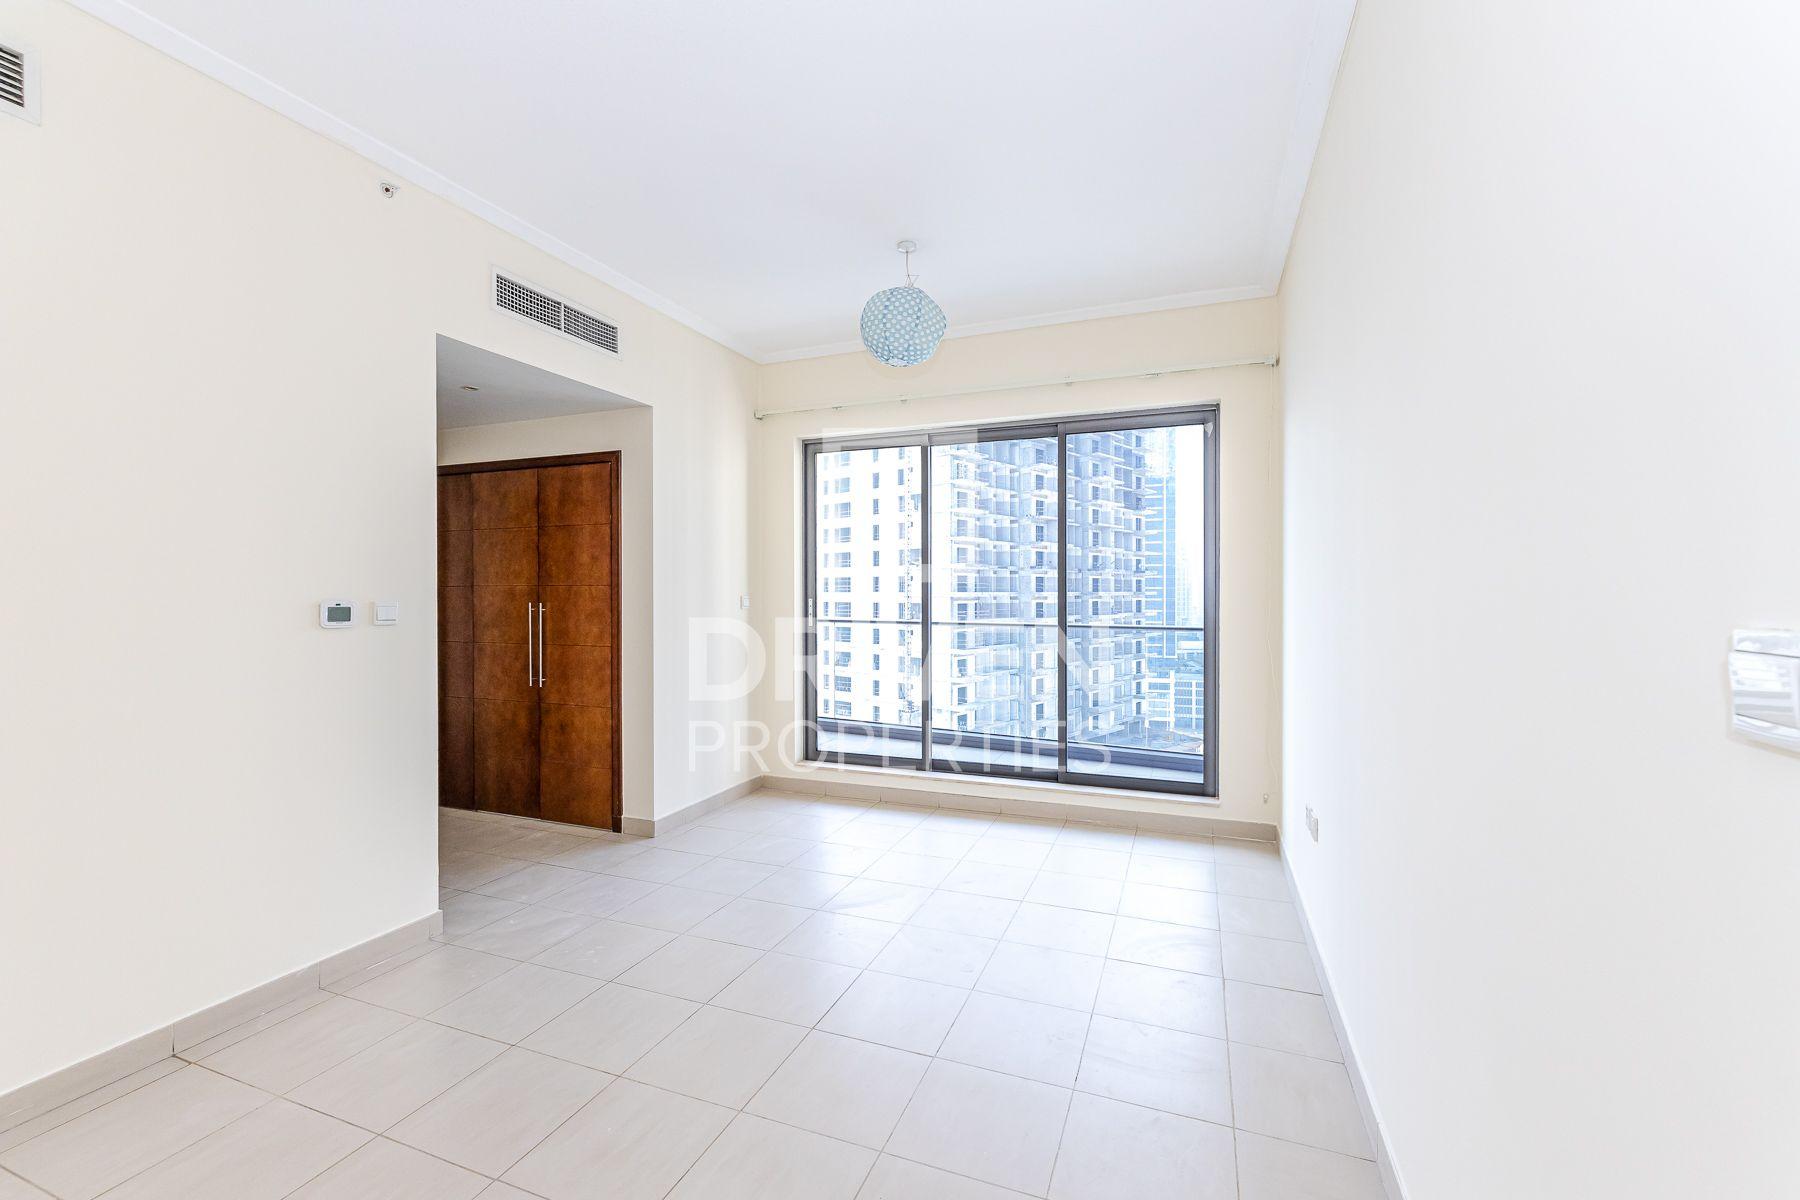 Apartment for Rent in South Ridge 5 - Downtown Dubai